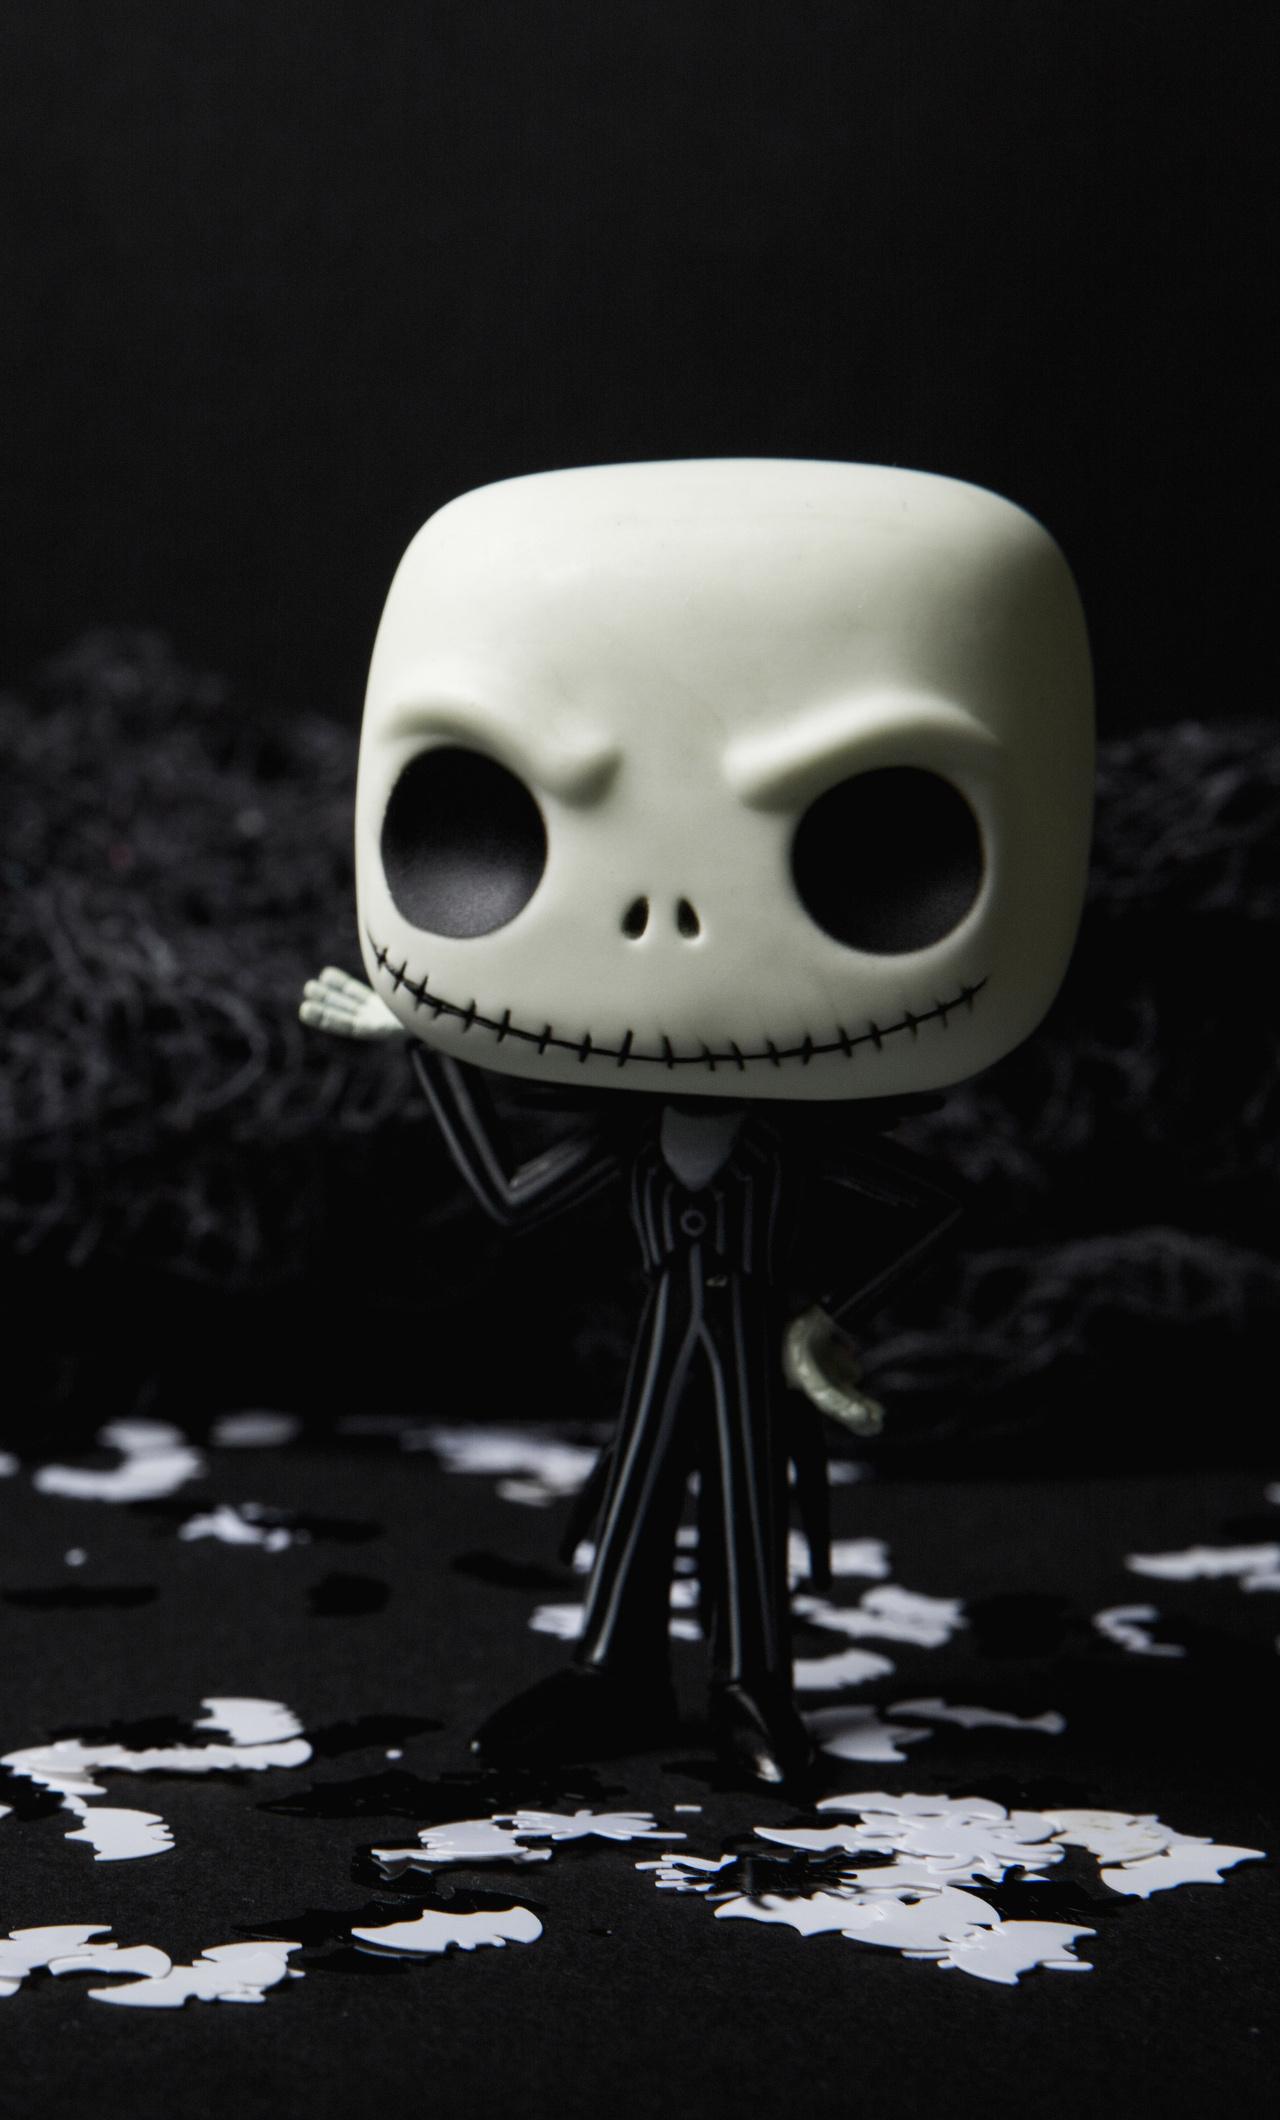 1280x2120 Scary Skull Doll Halloween Creepy 5k Iphone 6 Hd